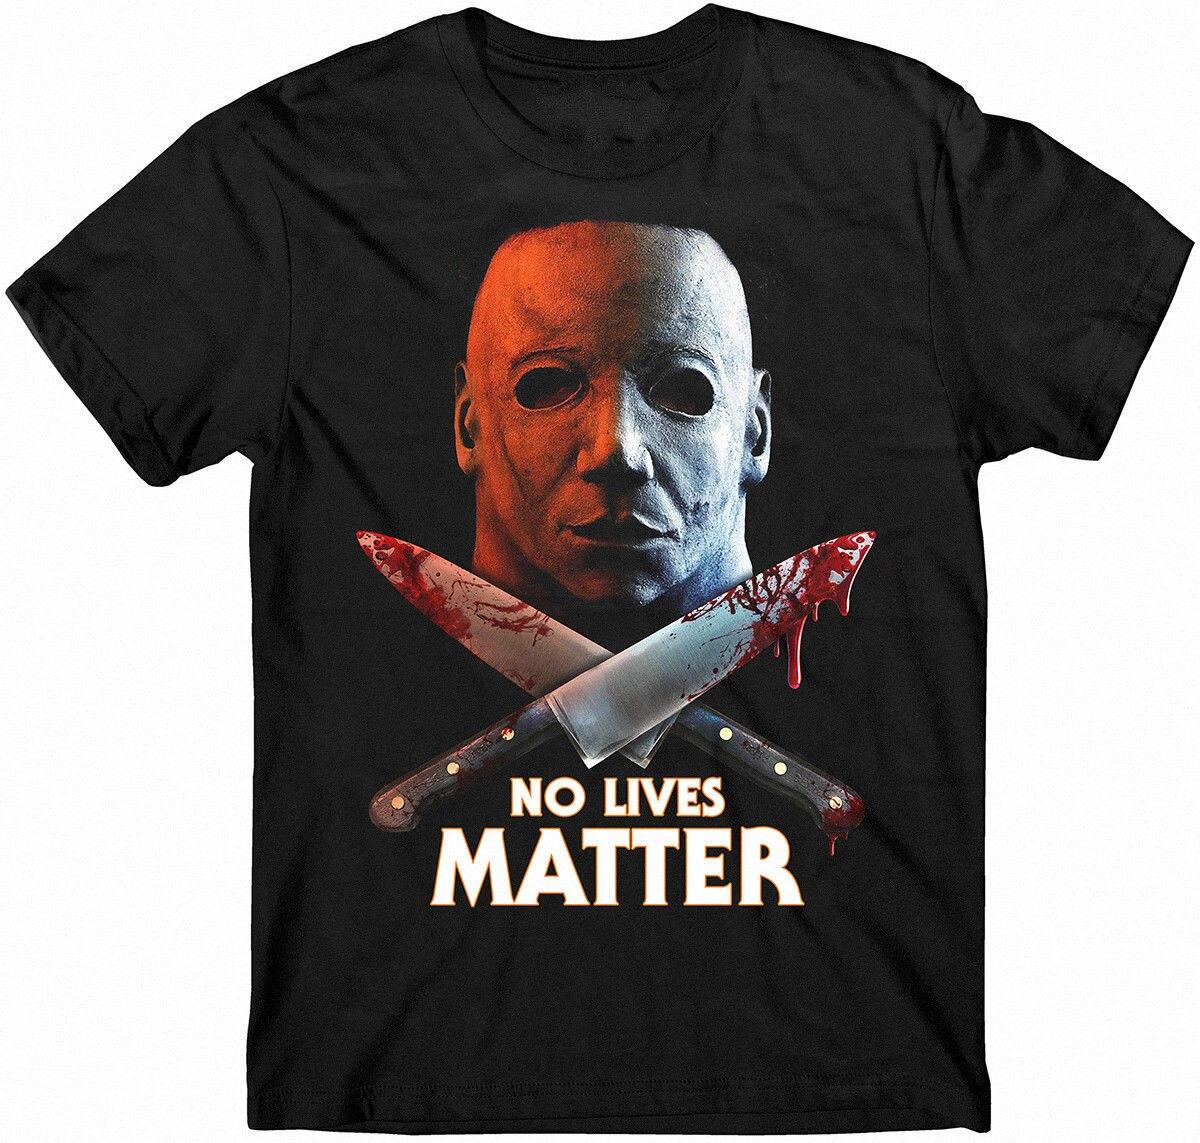 Halloween t-shirt, Michael Myers t-shirt, Knives t-shirt, No Lives Matter, Movie 2018 Summer MenS Brand Clothing O-Neck